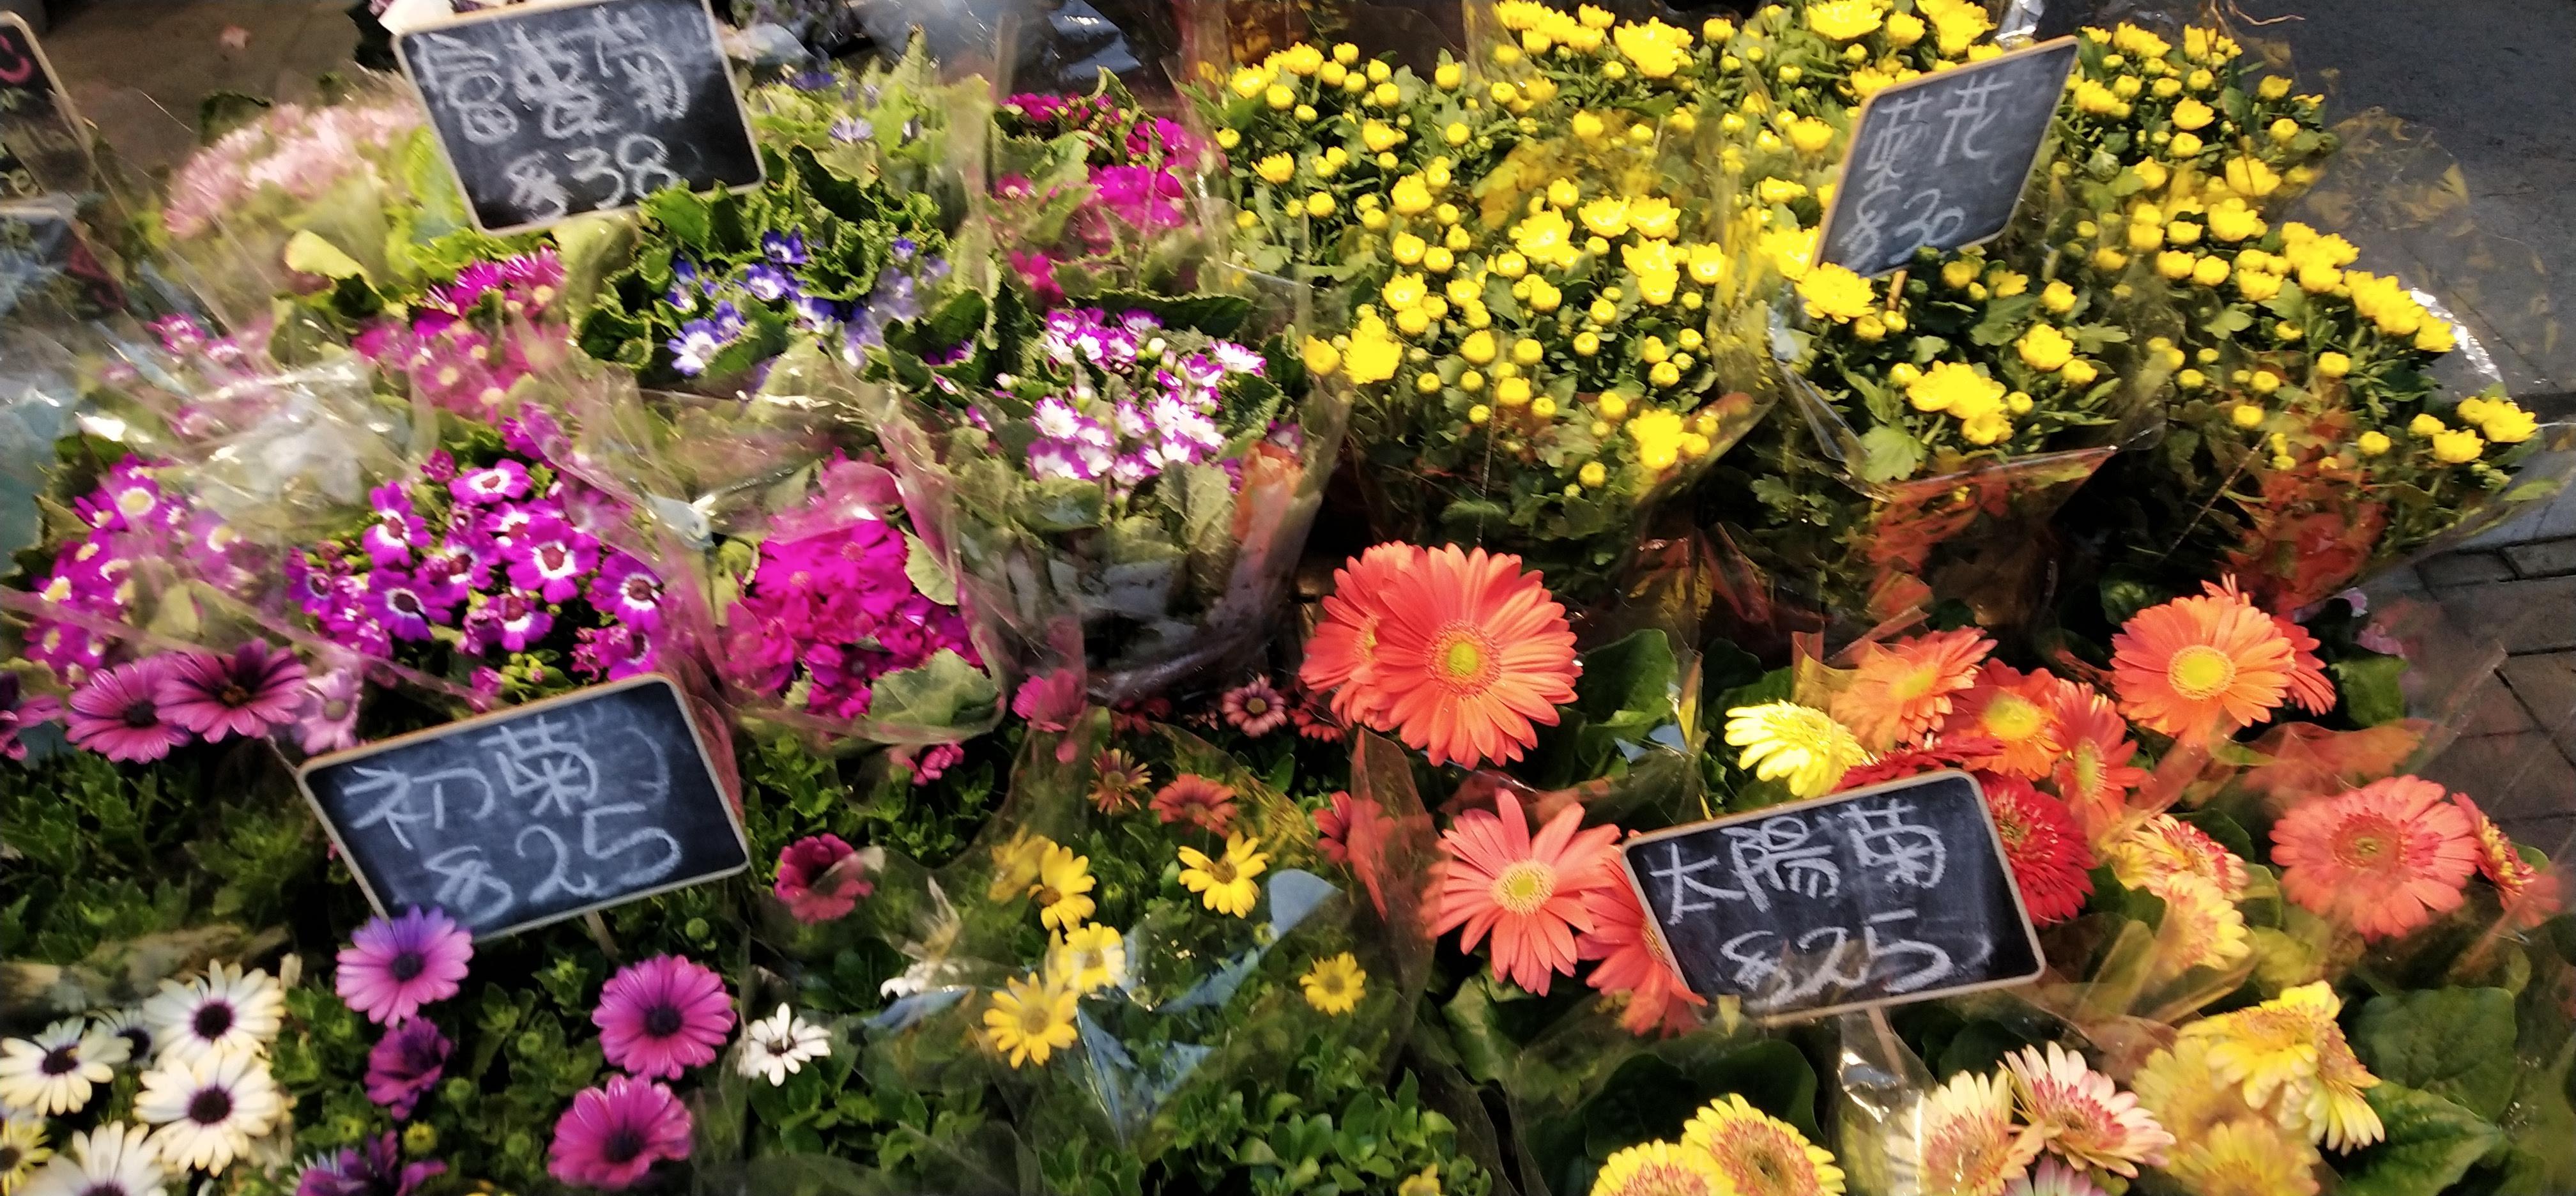 Flowers at Flower Market.